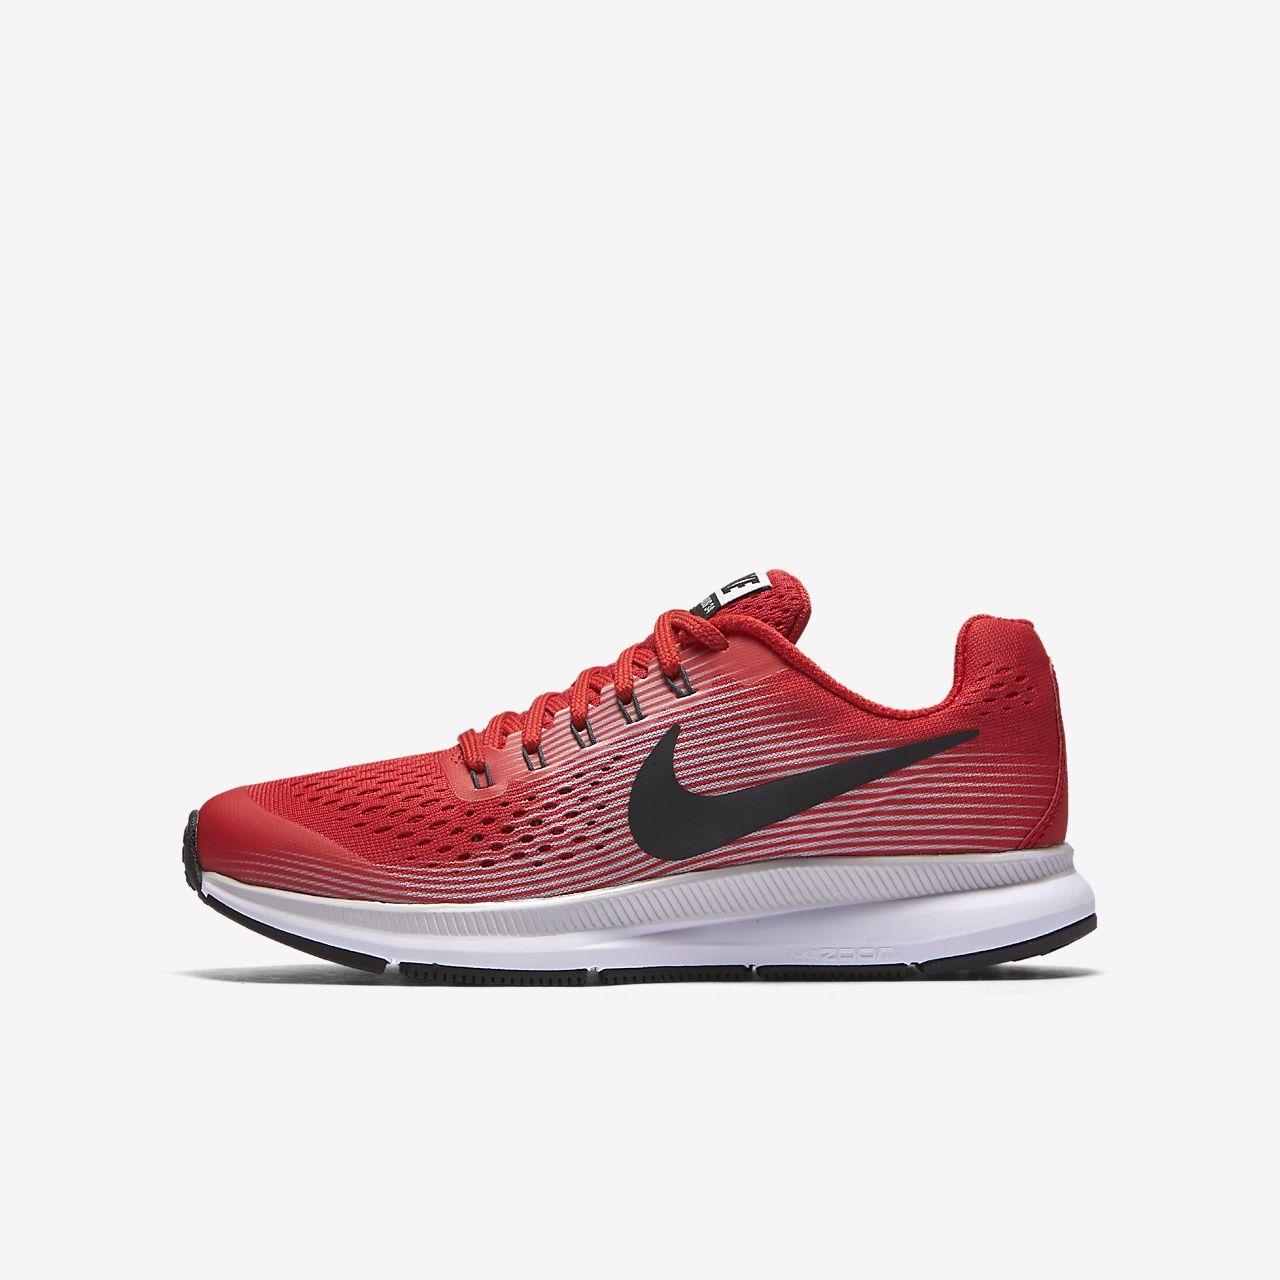 Zapatos grises Nike Tanjun infantiles talla 34 ulDsCq